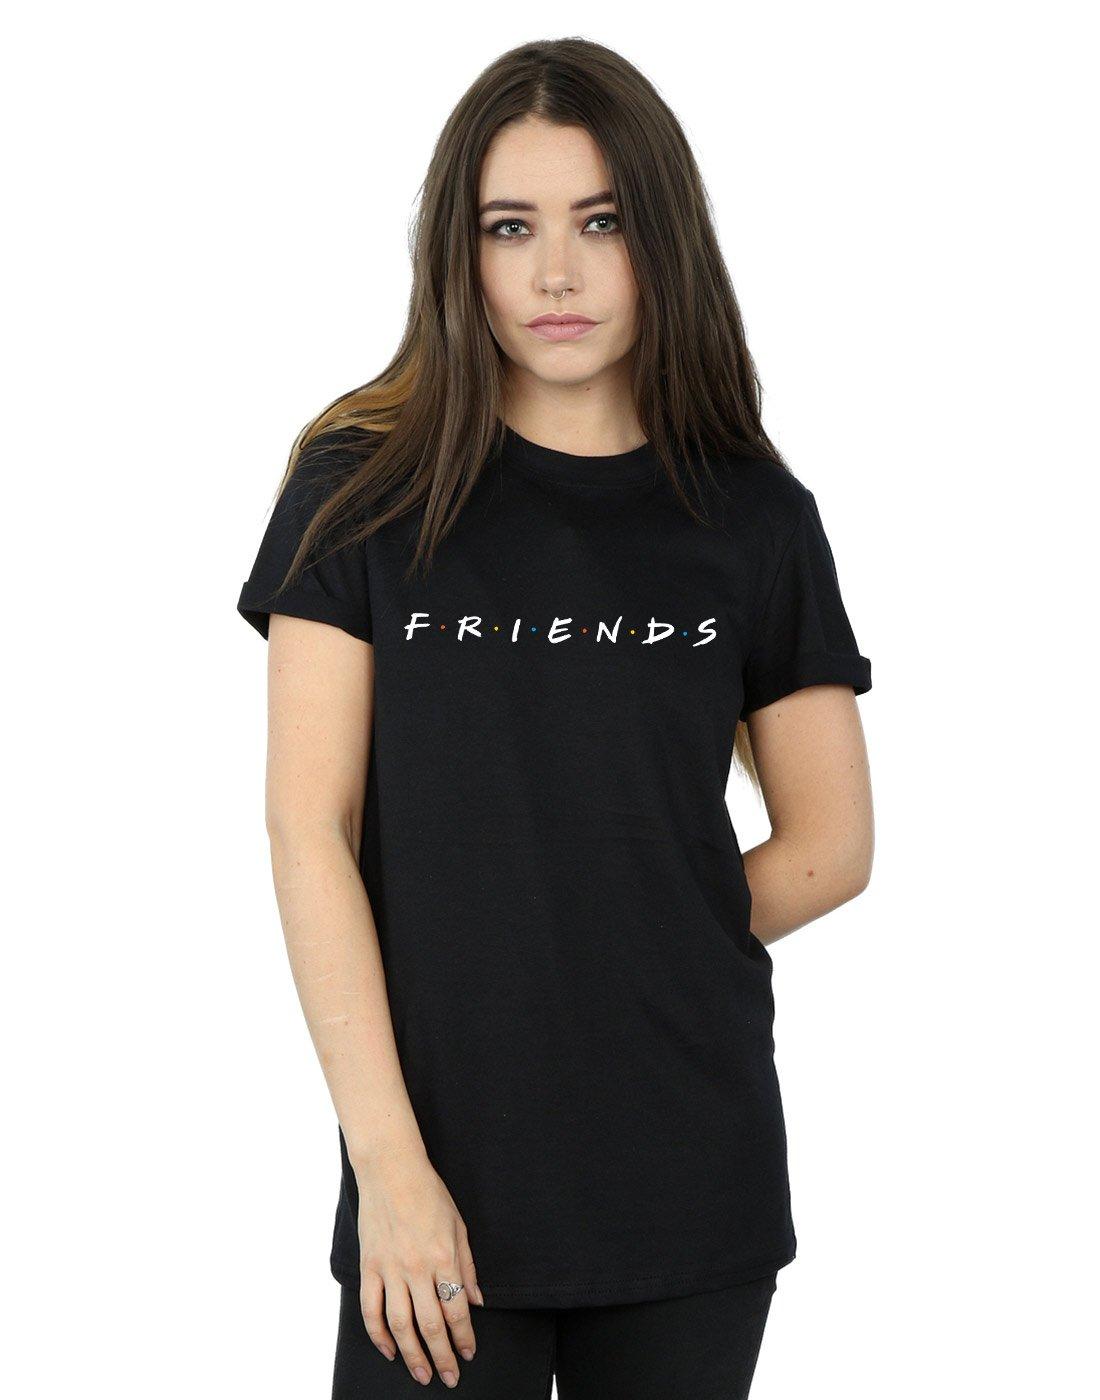 61zb76sXysL - Absolute Cult Friends Mujer Text Logo Camiseta del Novio Fit